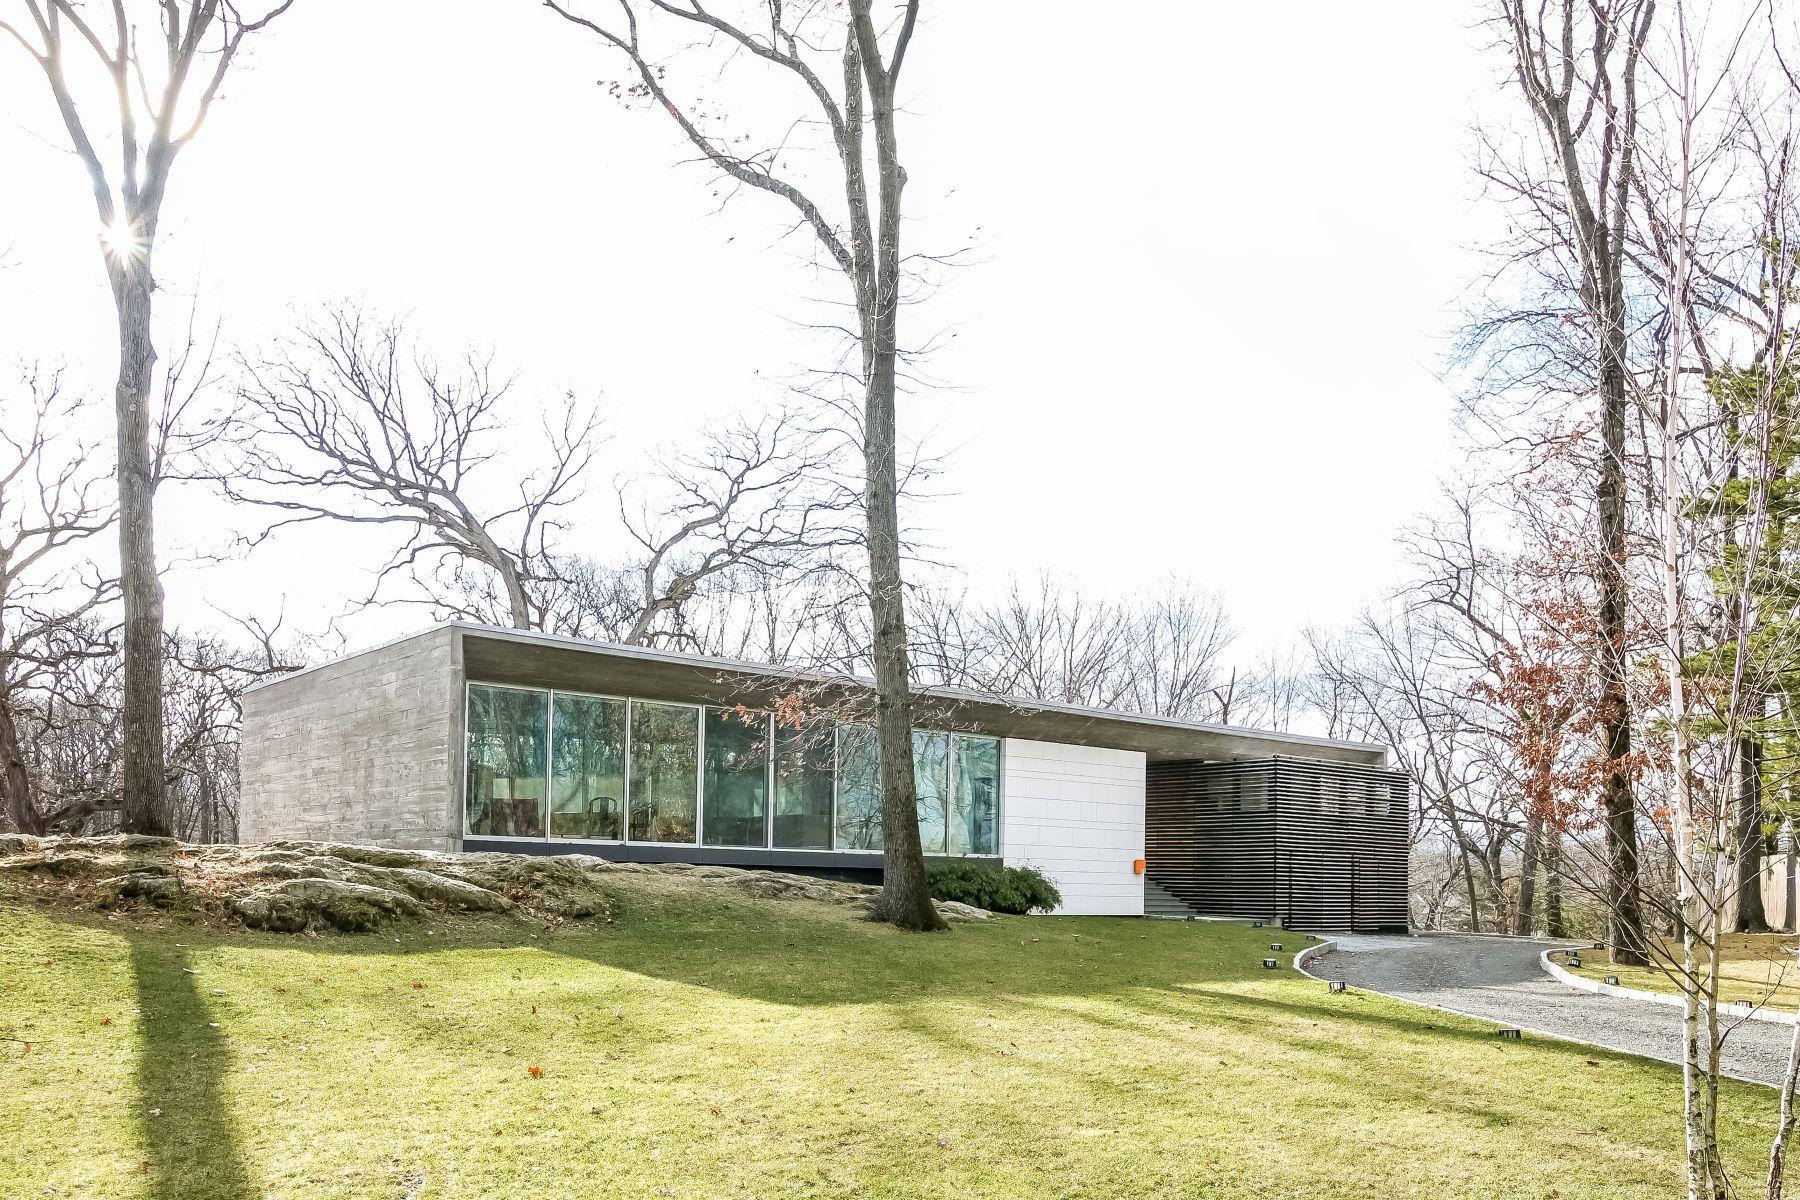 Частный односемейный дом для того Продажа на Rye Contemporary in Knob Hill 11 North Kirby Lane Rye, Нью-Йорк, 10580 Соединенные Штаты